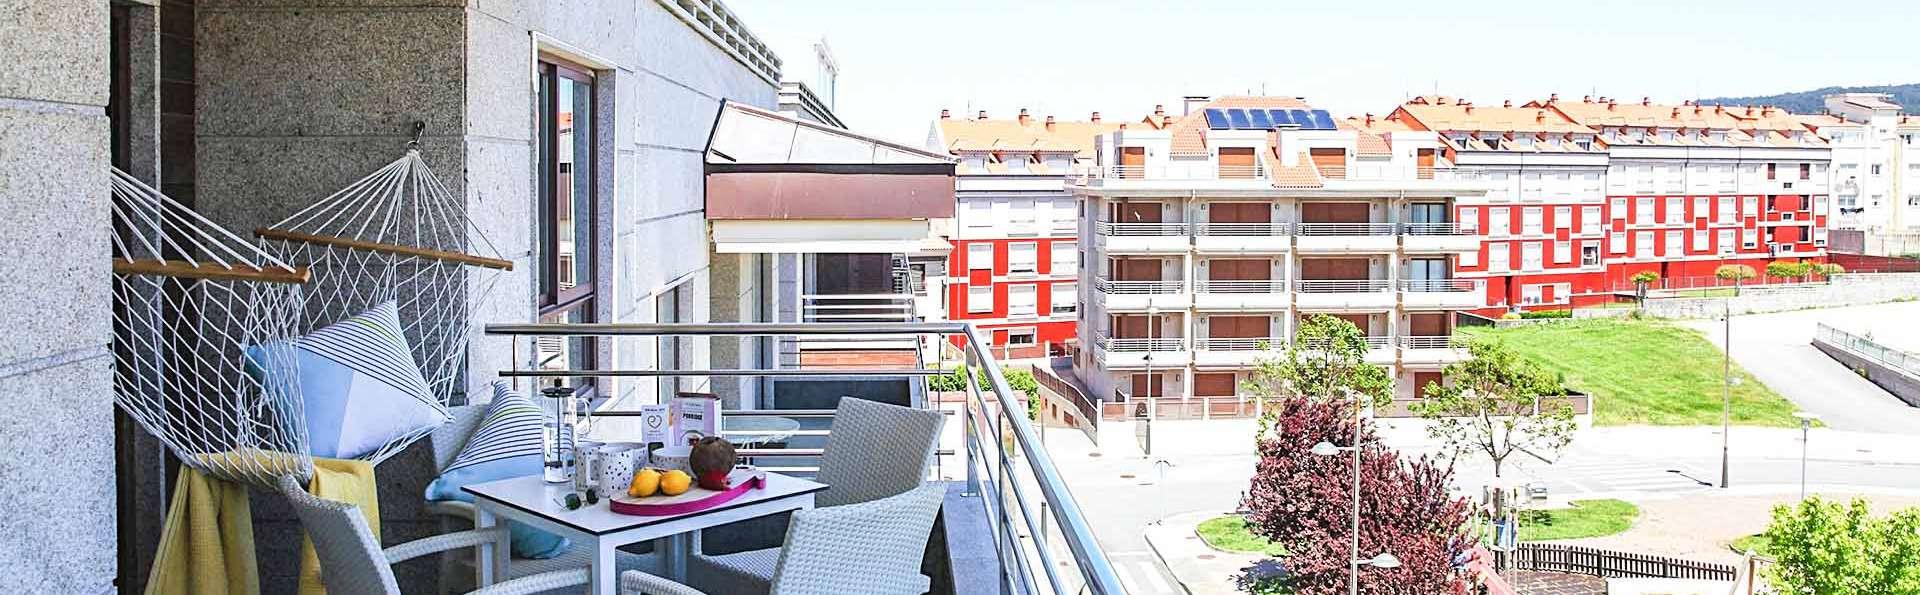 Apartamentos Class & Confort - EDIT_TERRACE_03.jpg